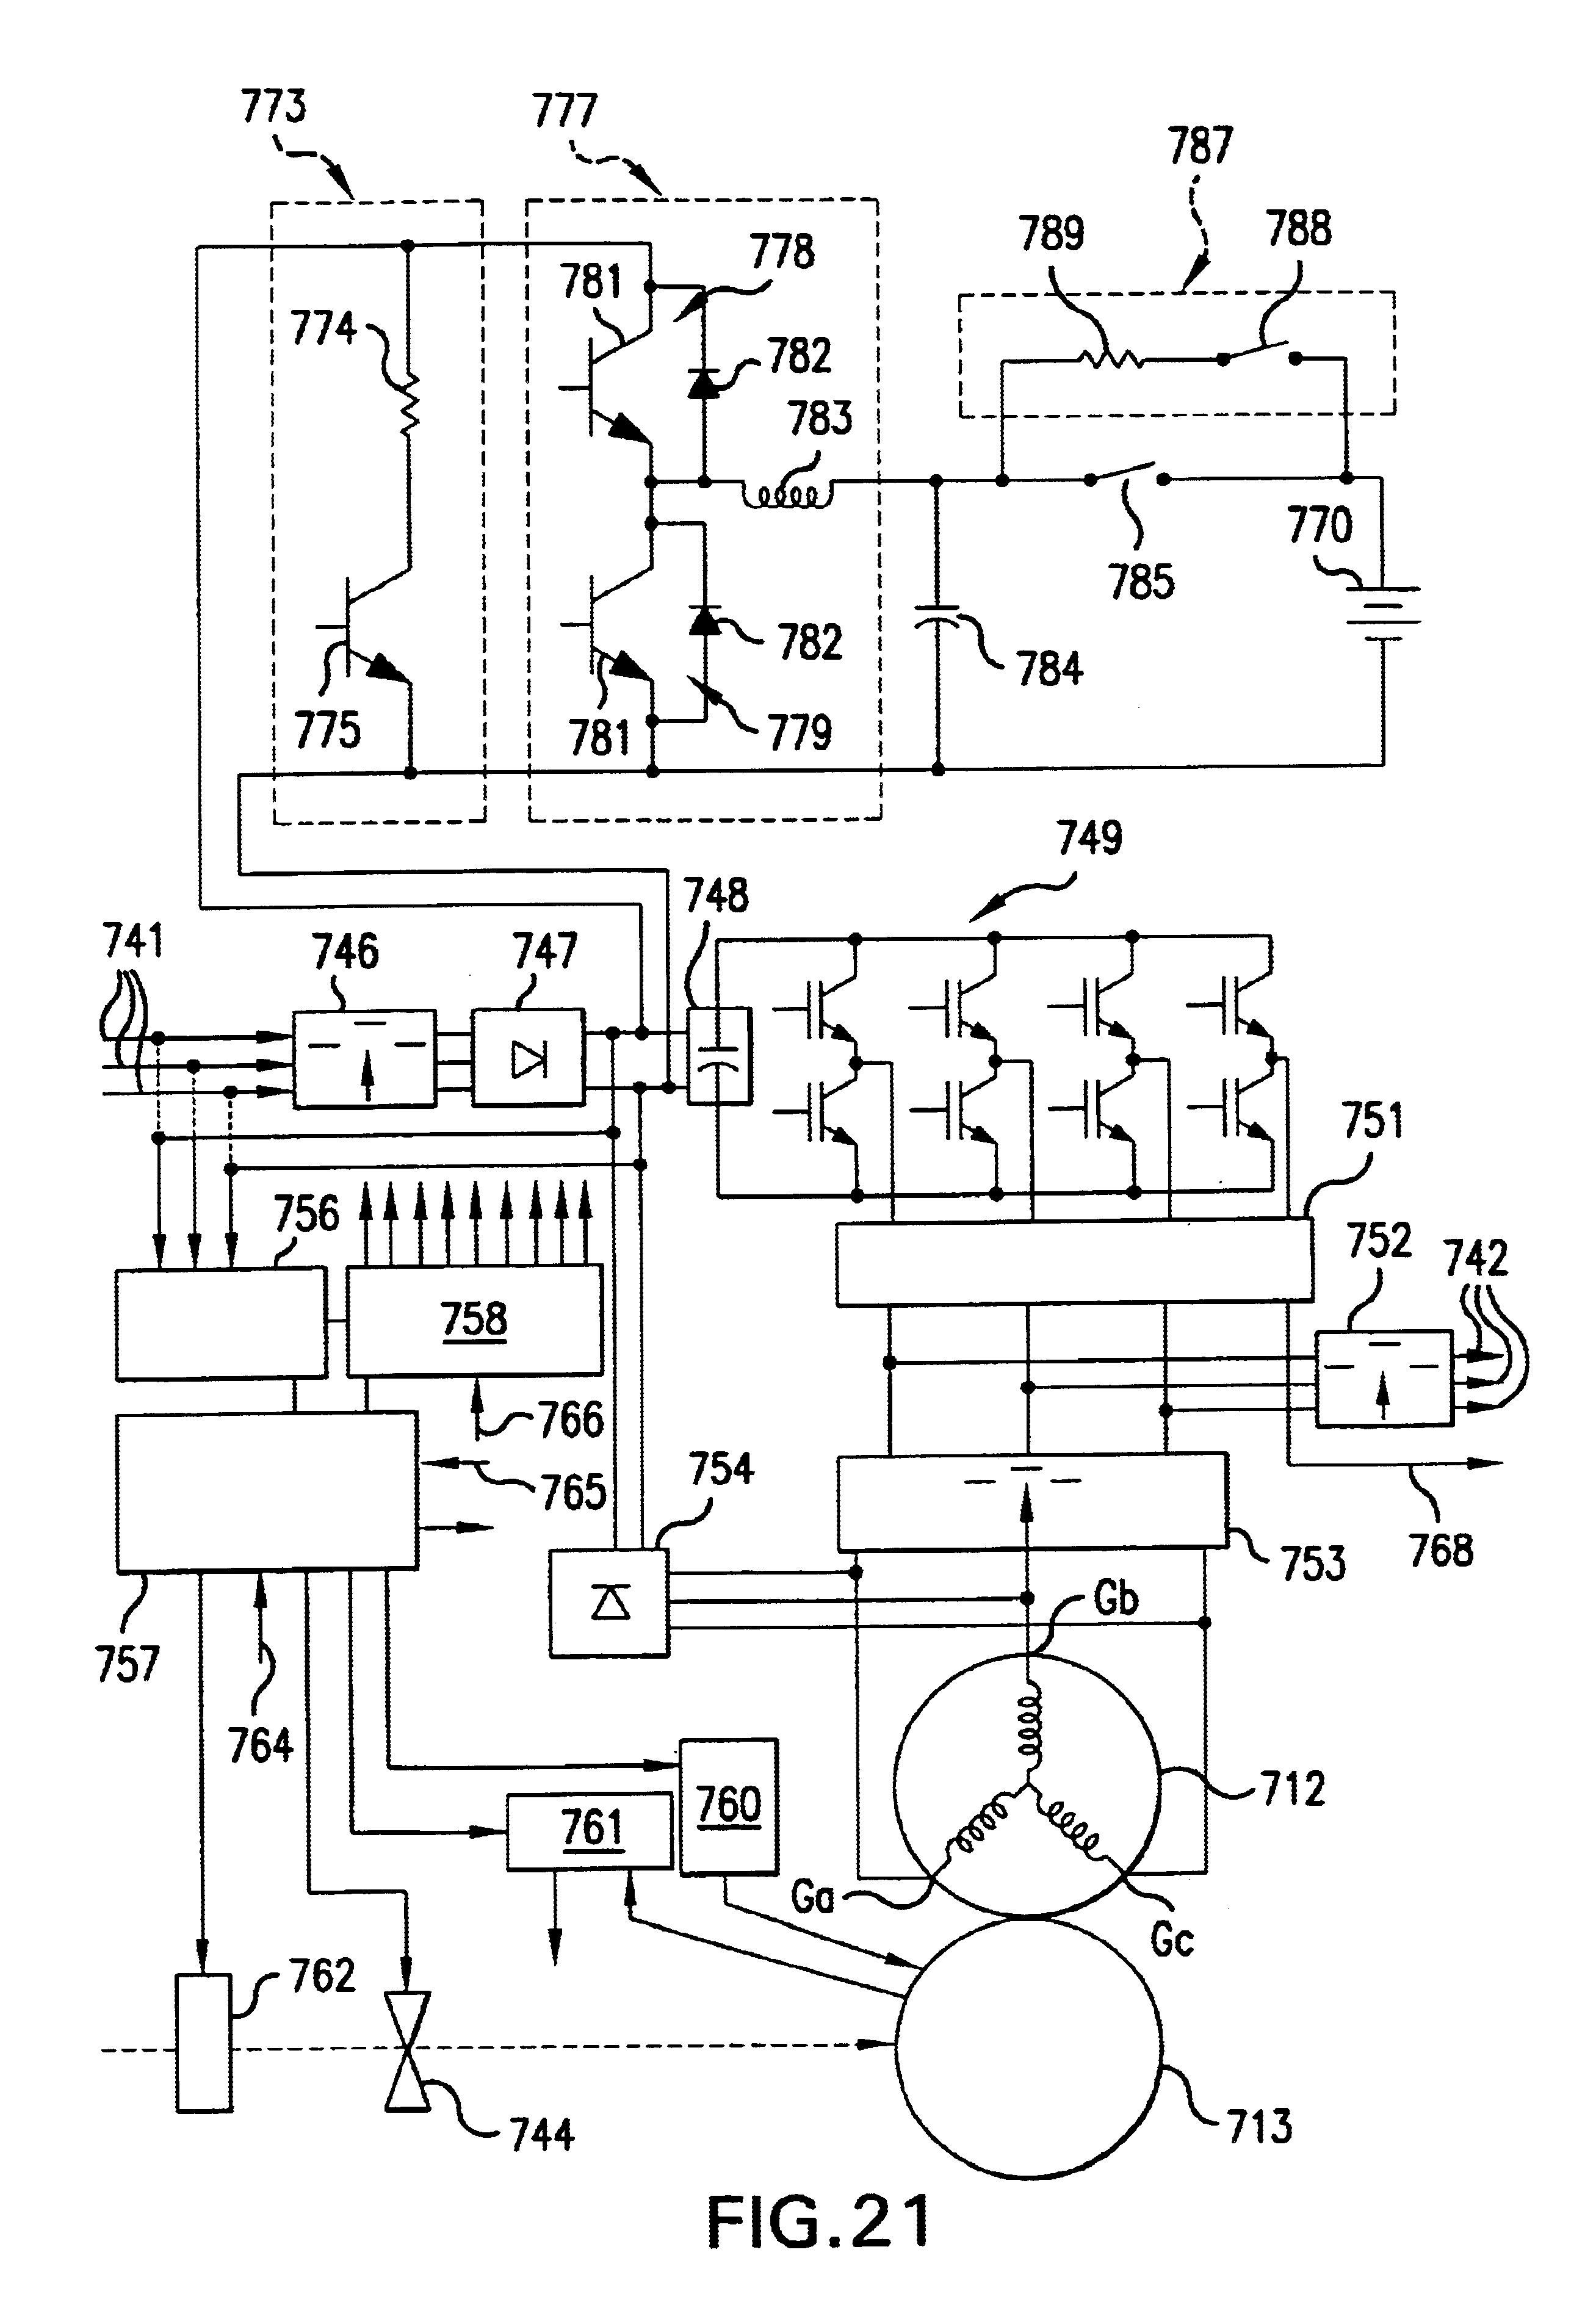 abb vfd control wiring abb vfd wiring diagram abb vfd wiring diagram free  download wiring diagrams